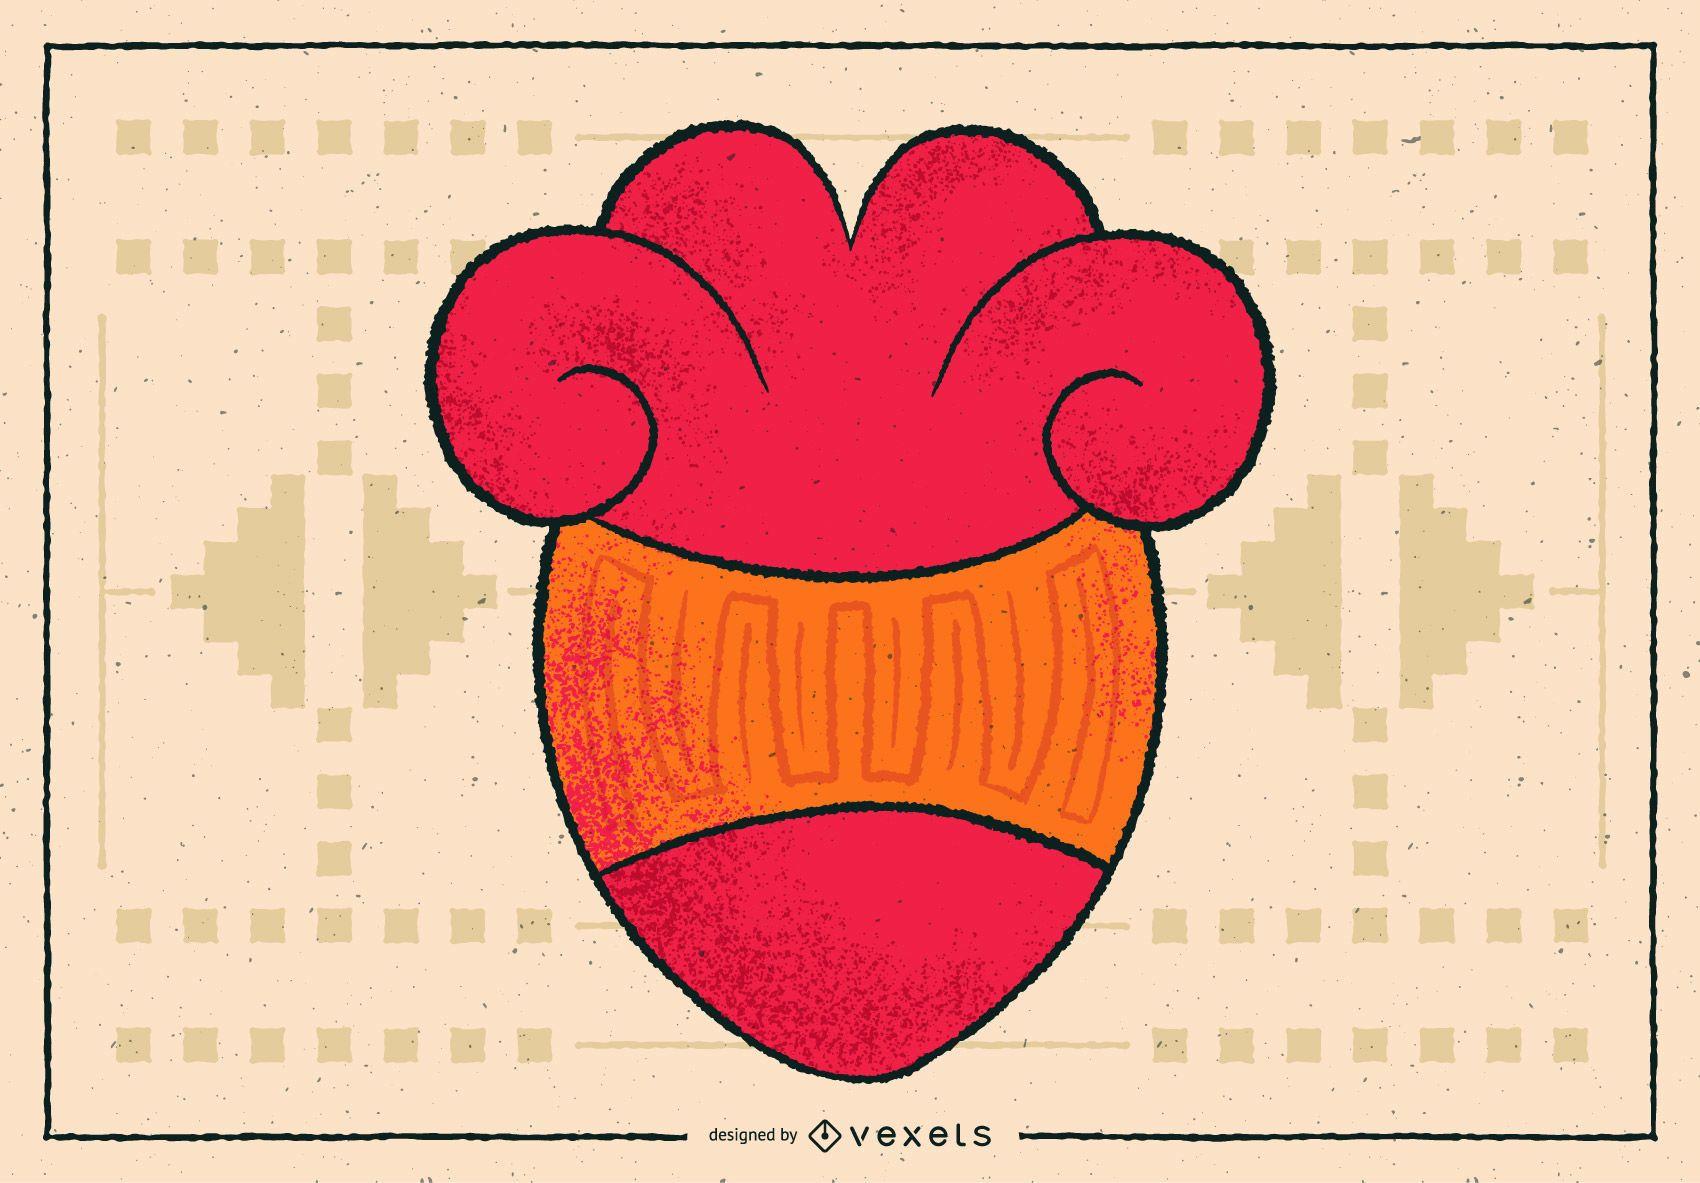 Aztec Heart Illustration Design